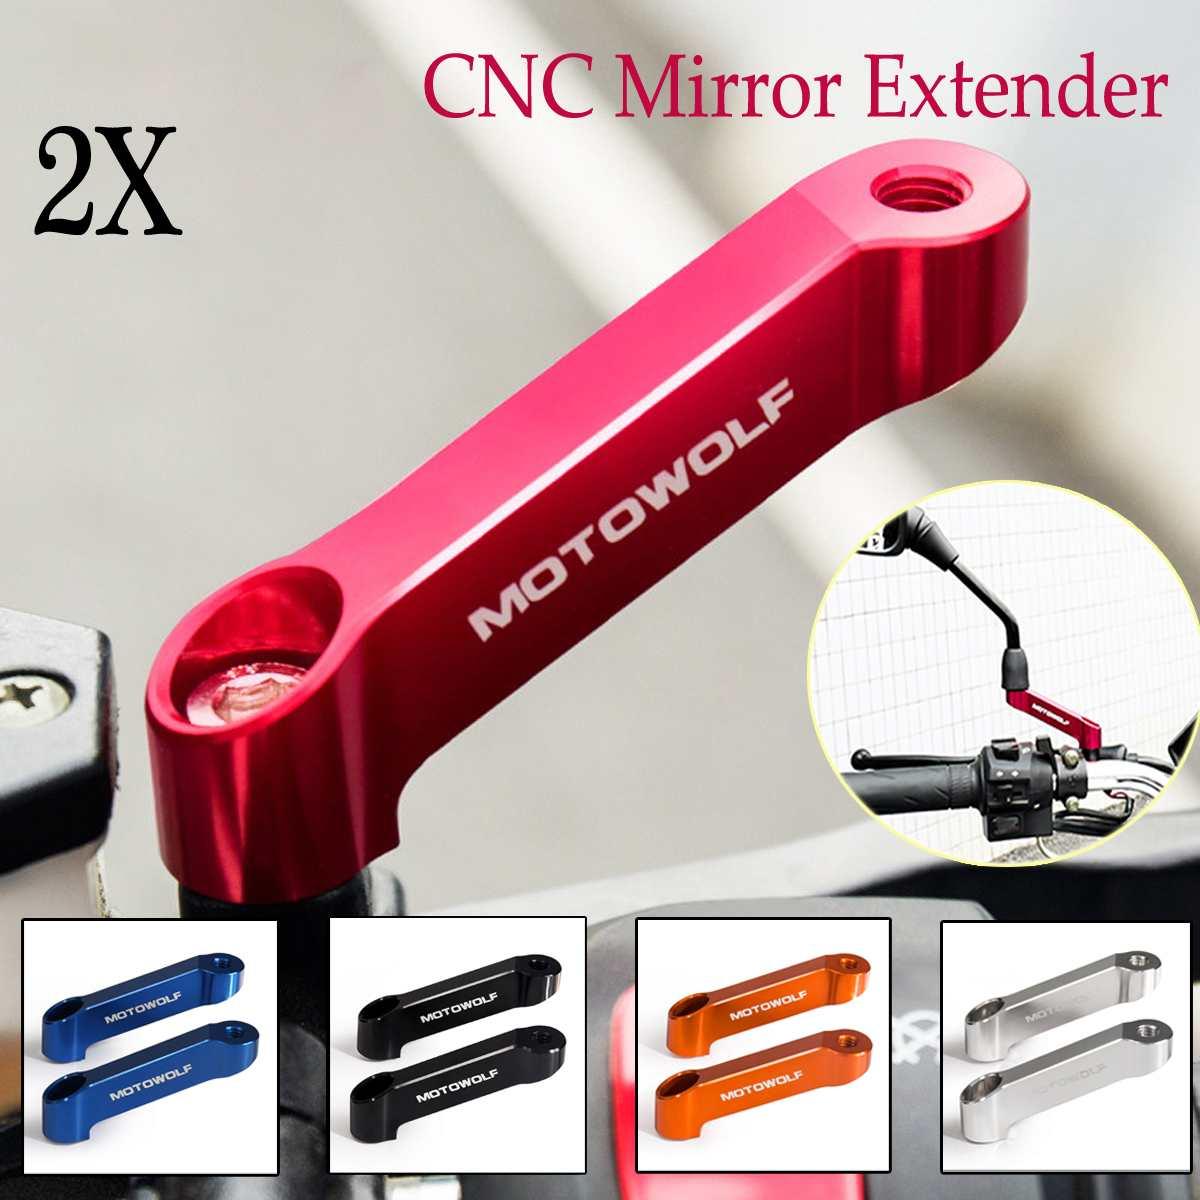 Motorcycle-Rearview-Mirror-Extension-Mount-Bracket-Holder-Universal-8-10mm-Motorbike-Rear-view-Mirror-Extension-Bracket-18